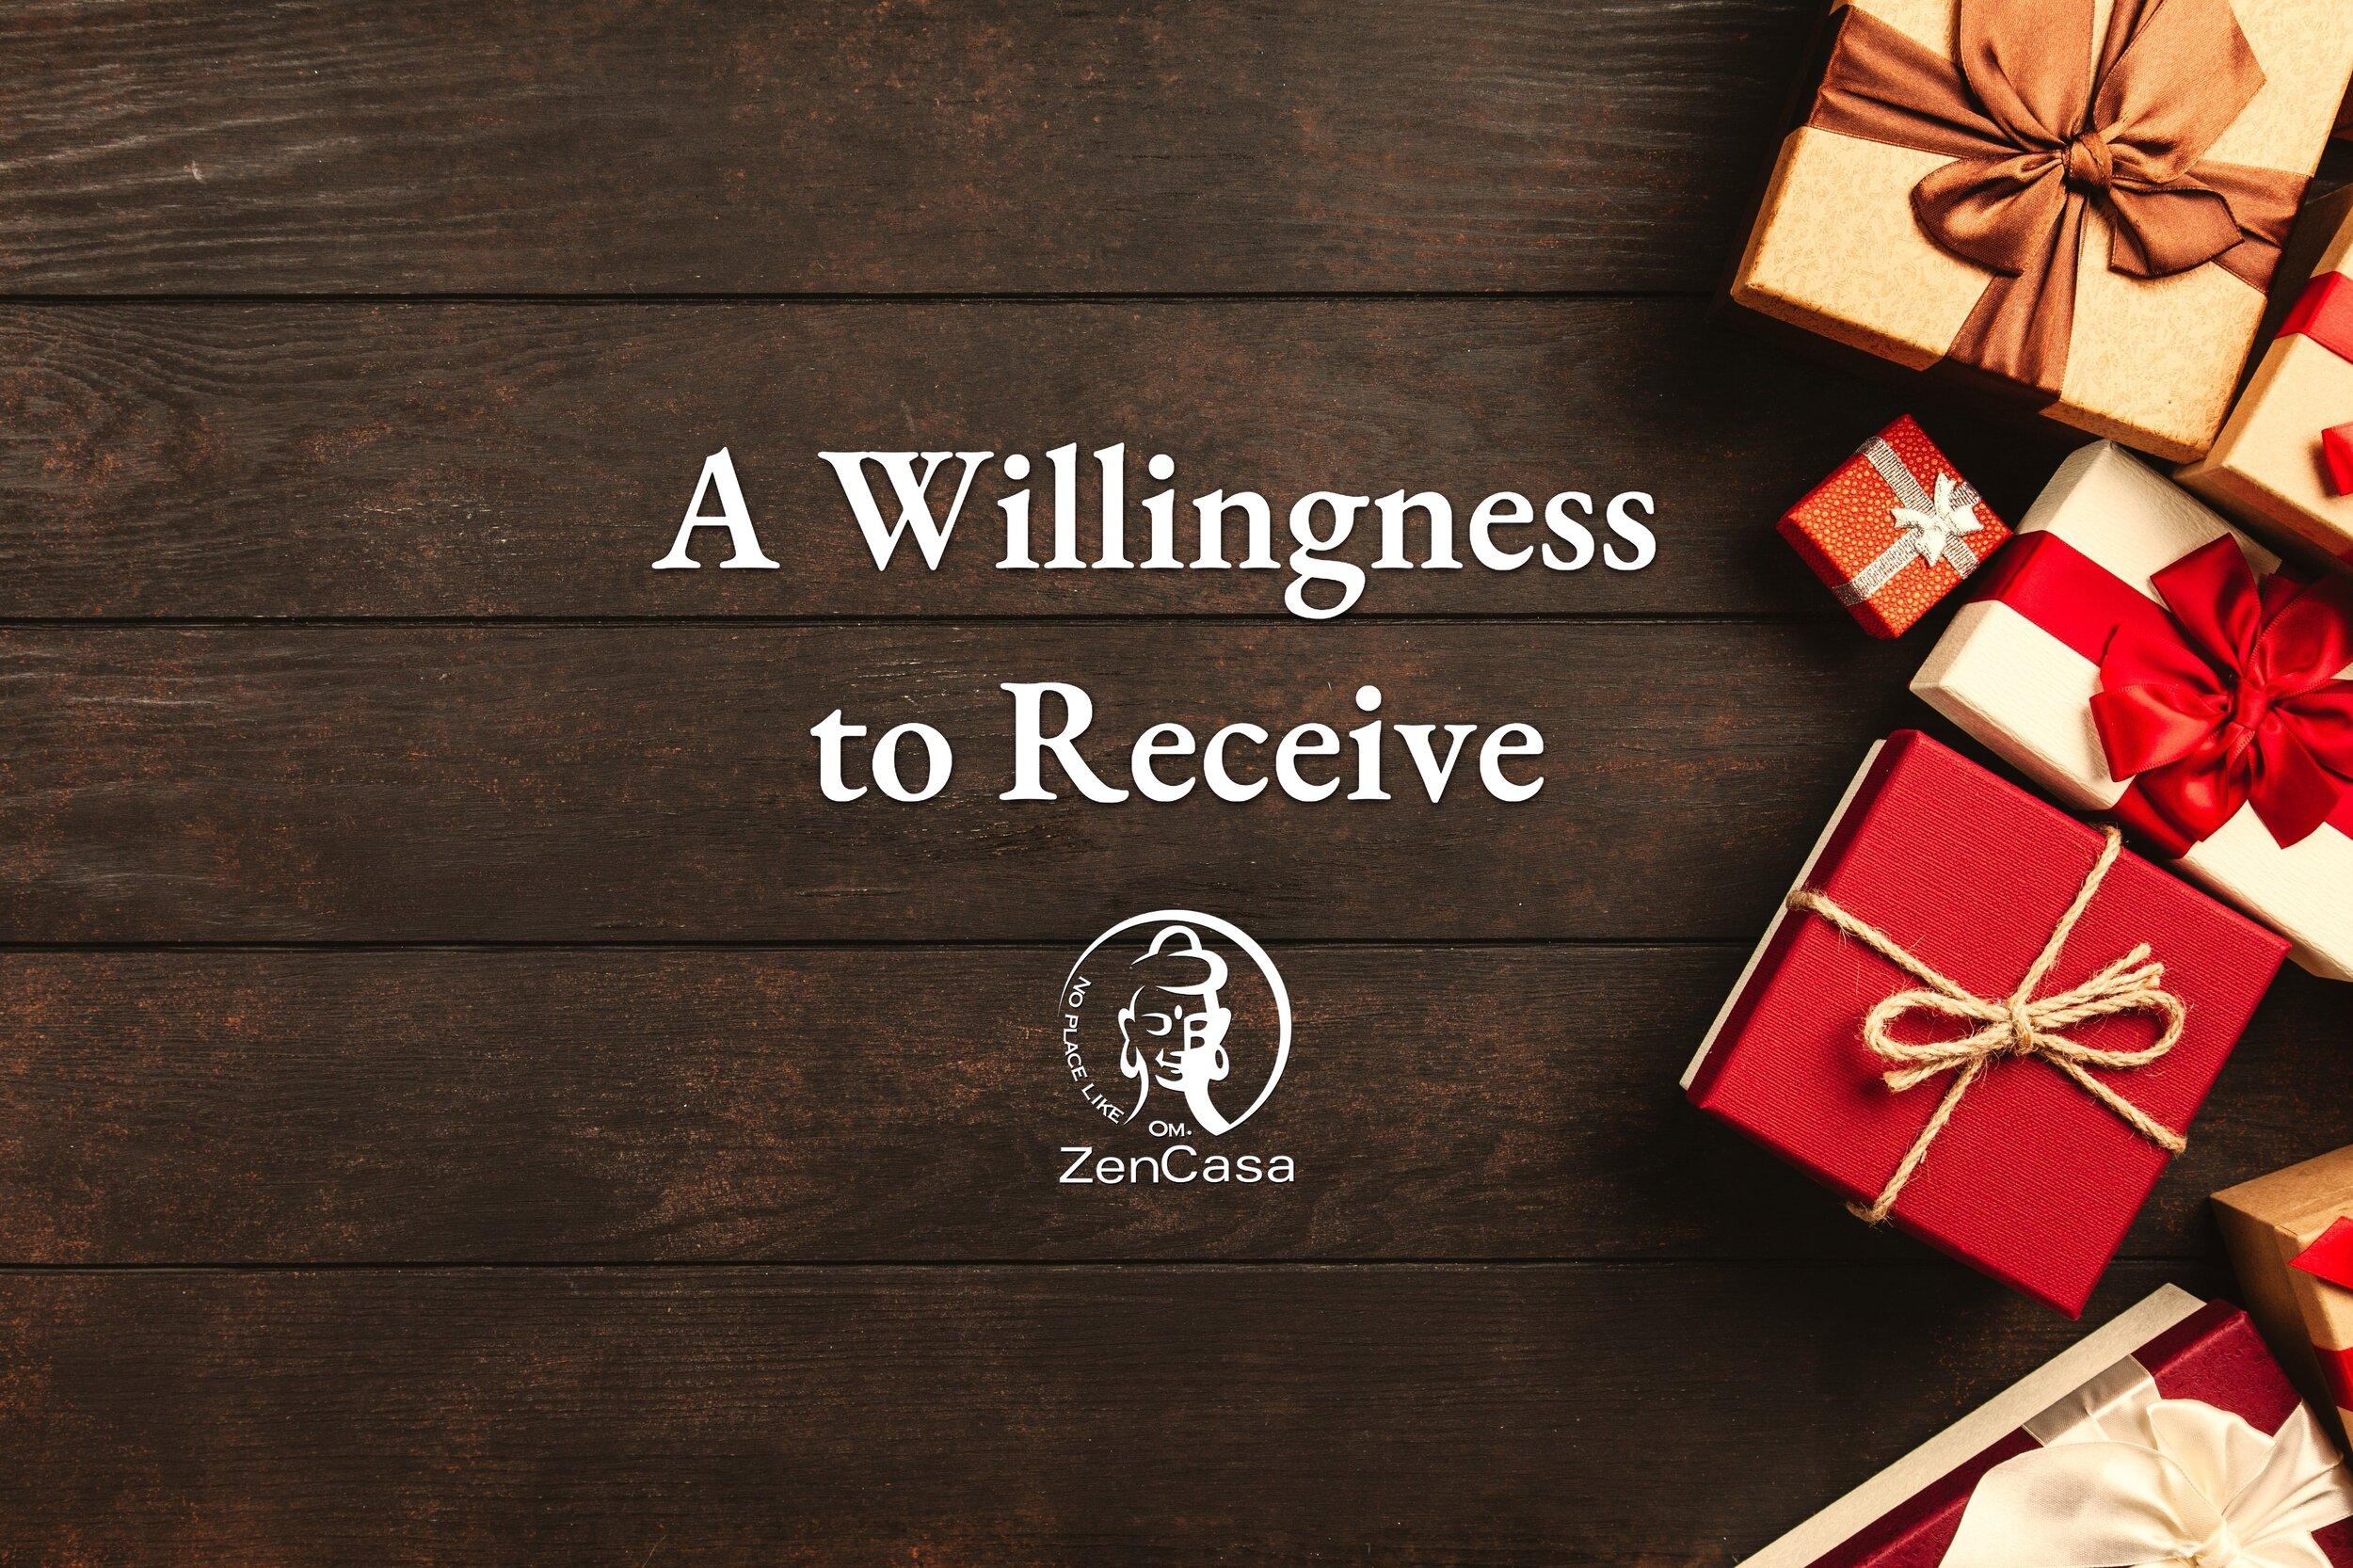 Willingness-to-receive.jpg